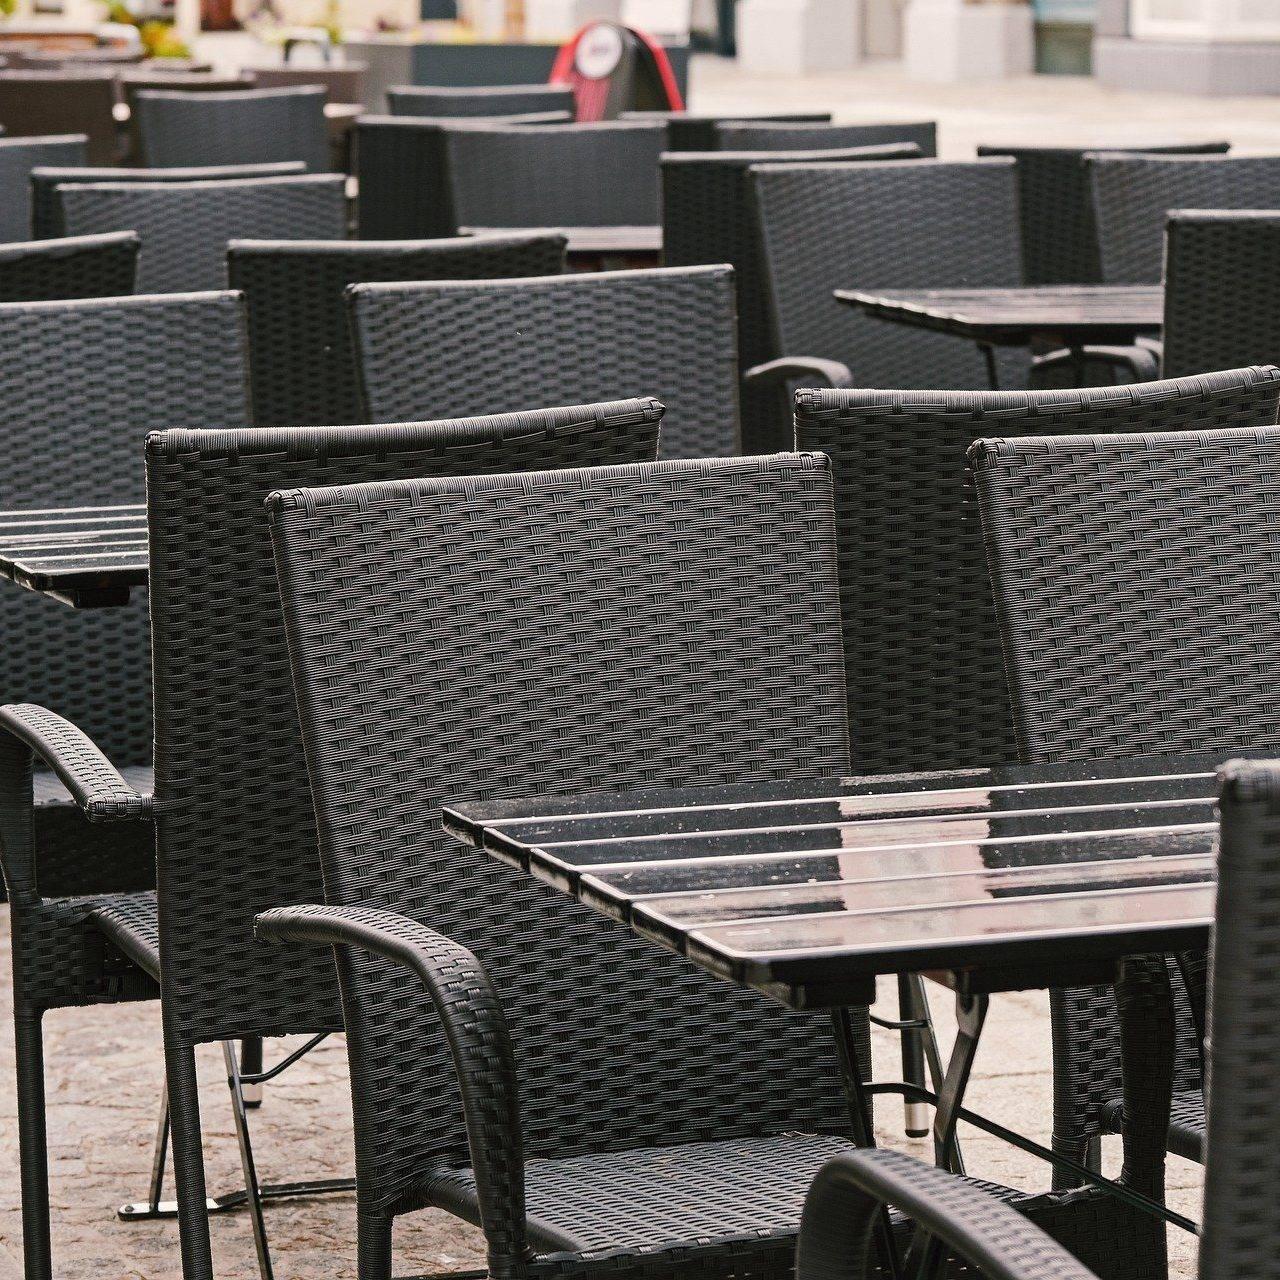 Tische leer - Corona Novemberhilfe